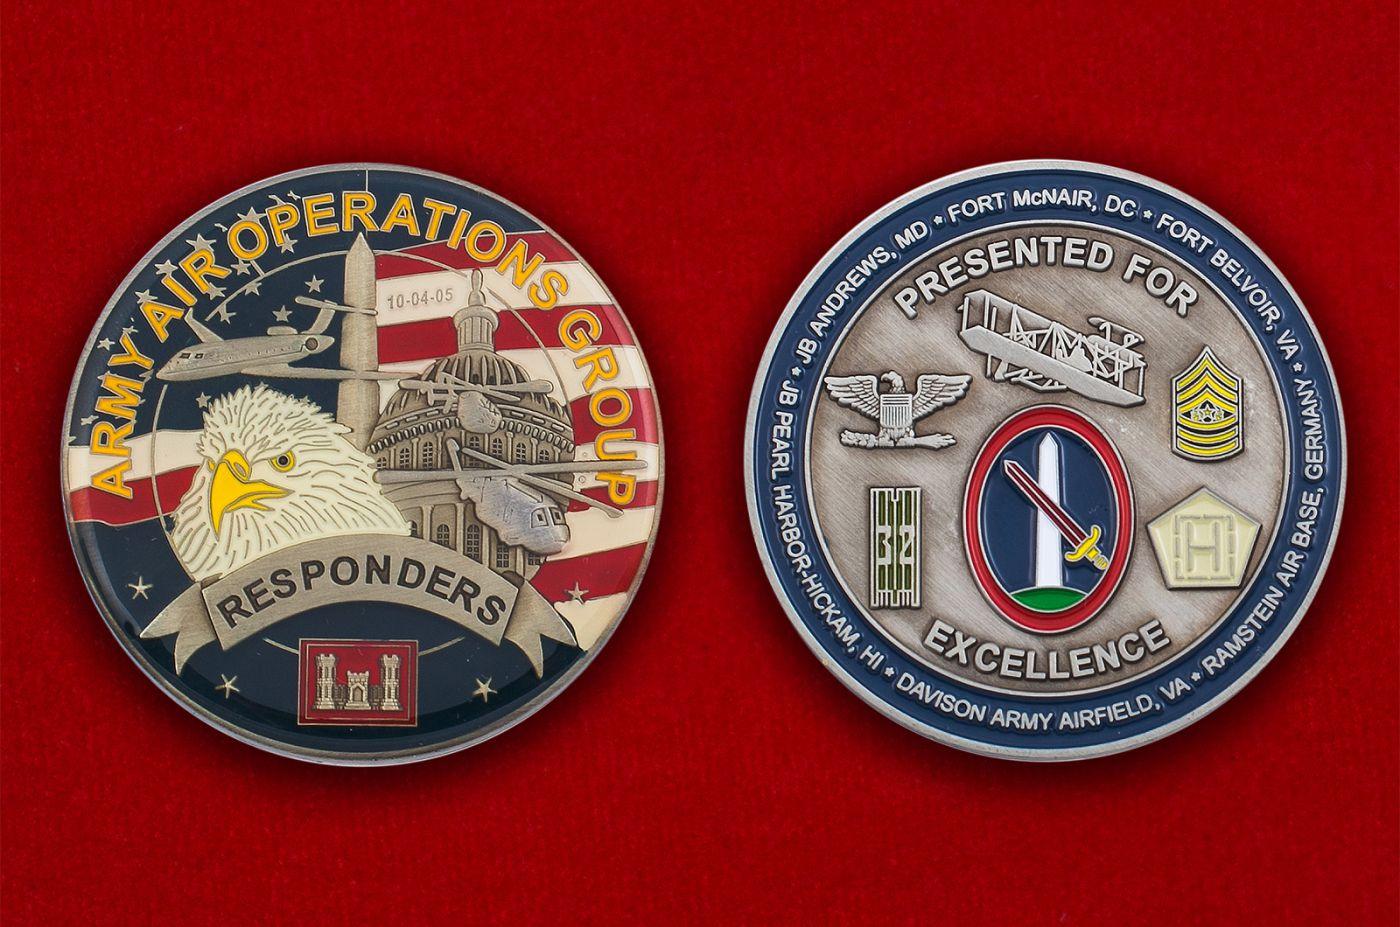 Челлендж коин армейской авиации ВС США - аверс и реверс